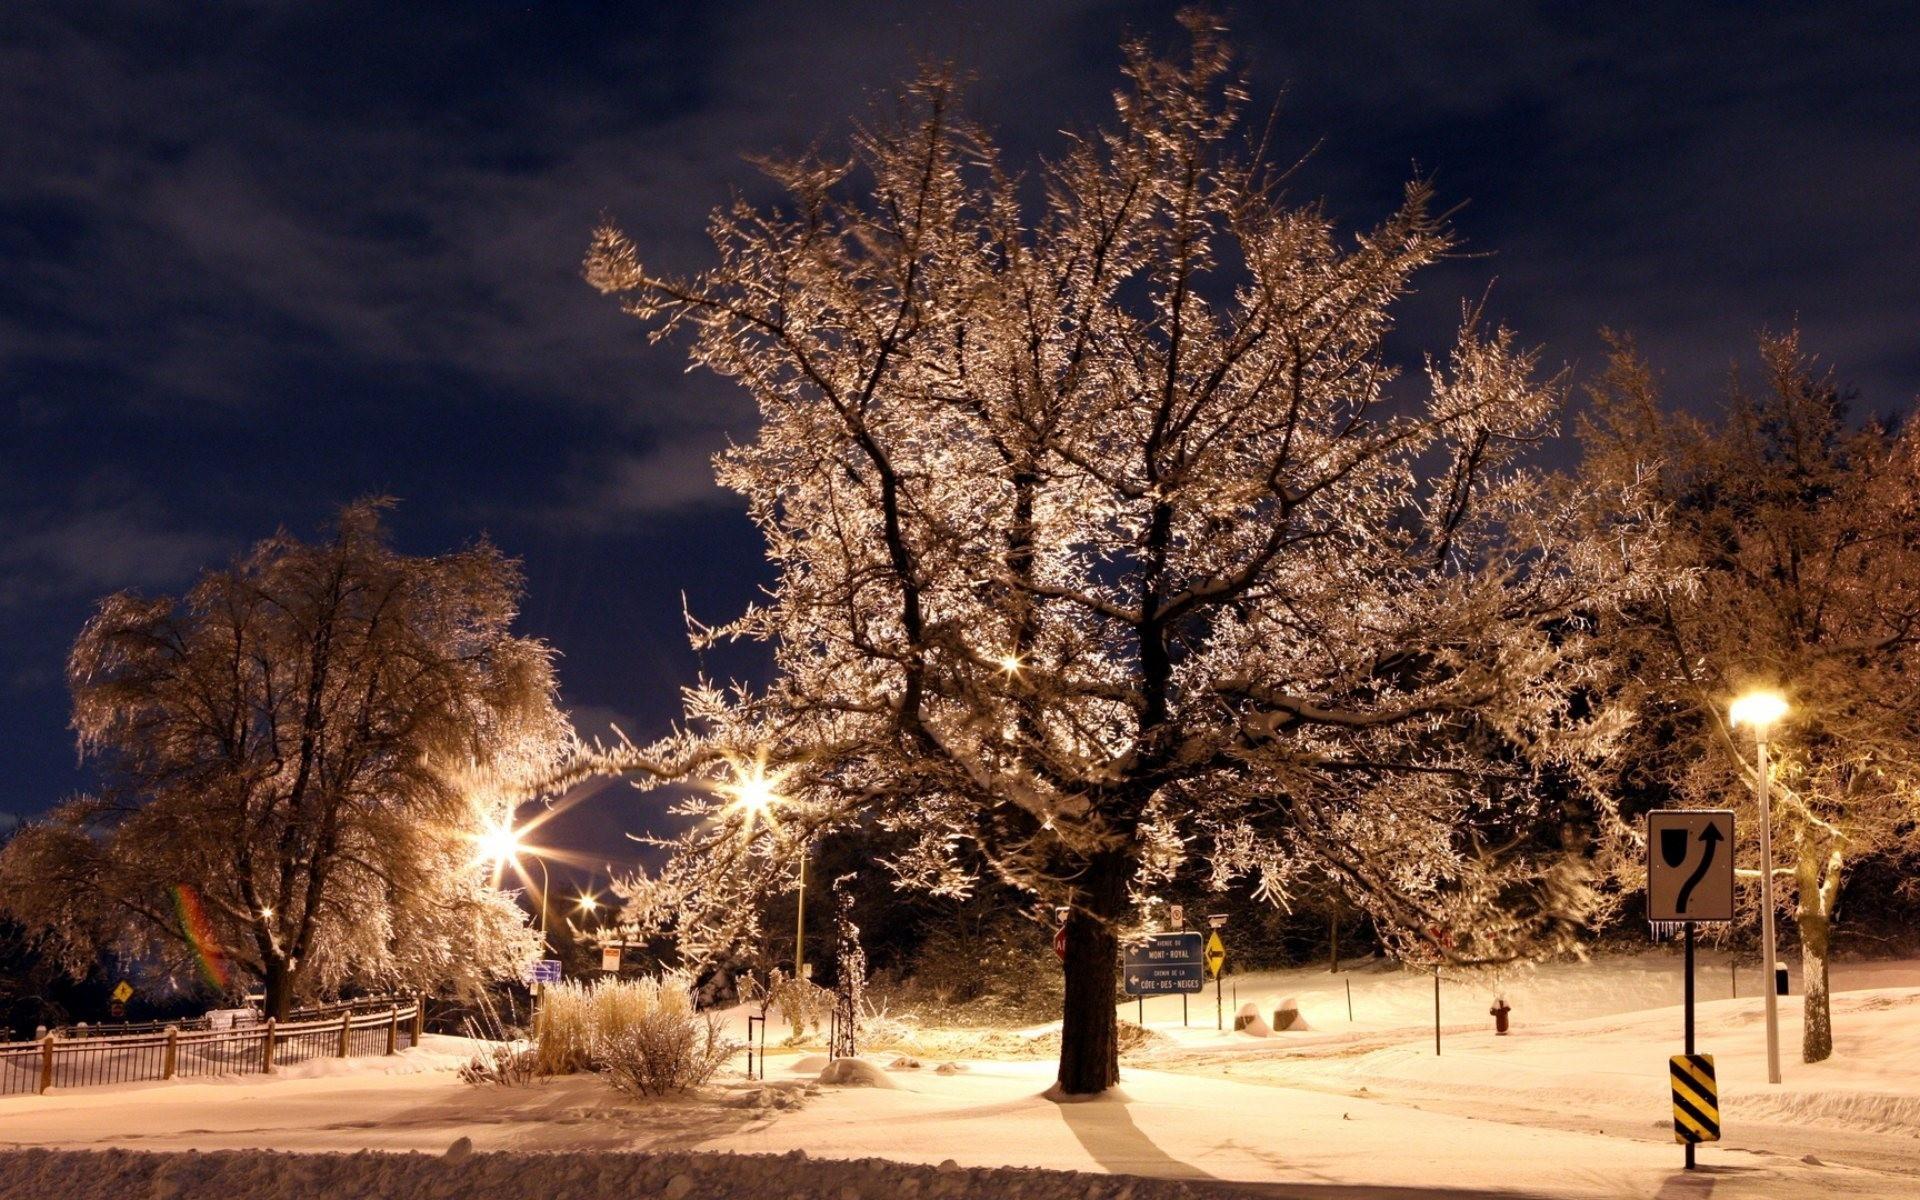 Winter Night in the Park HD Wallpaper